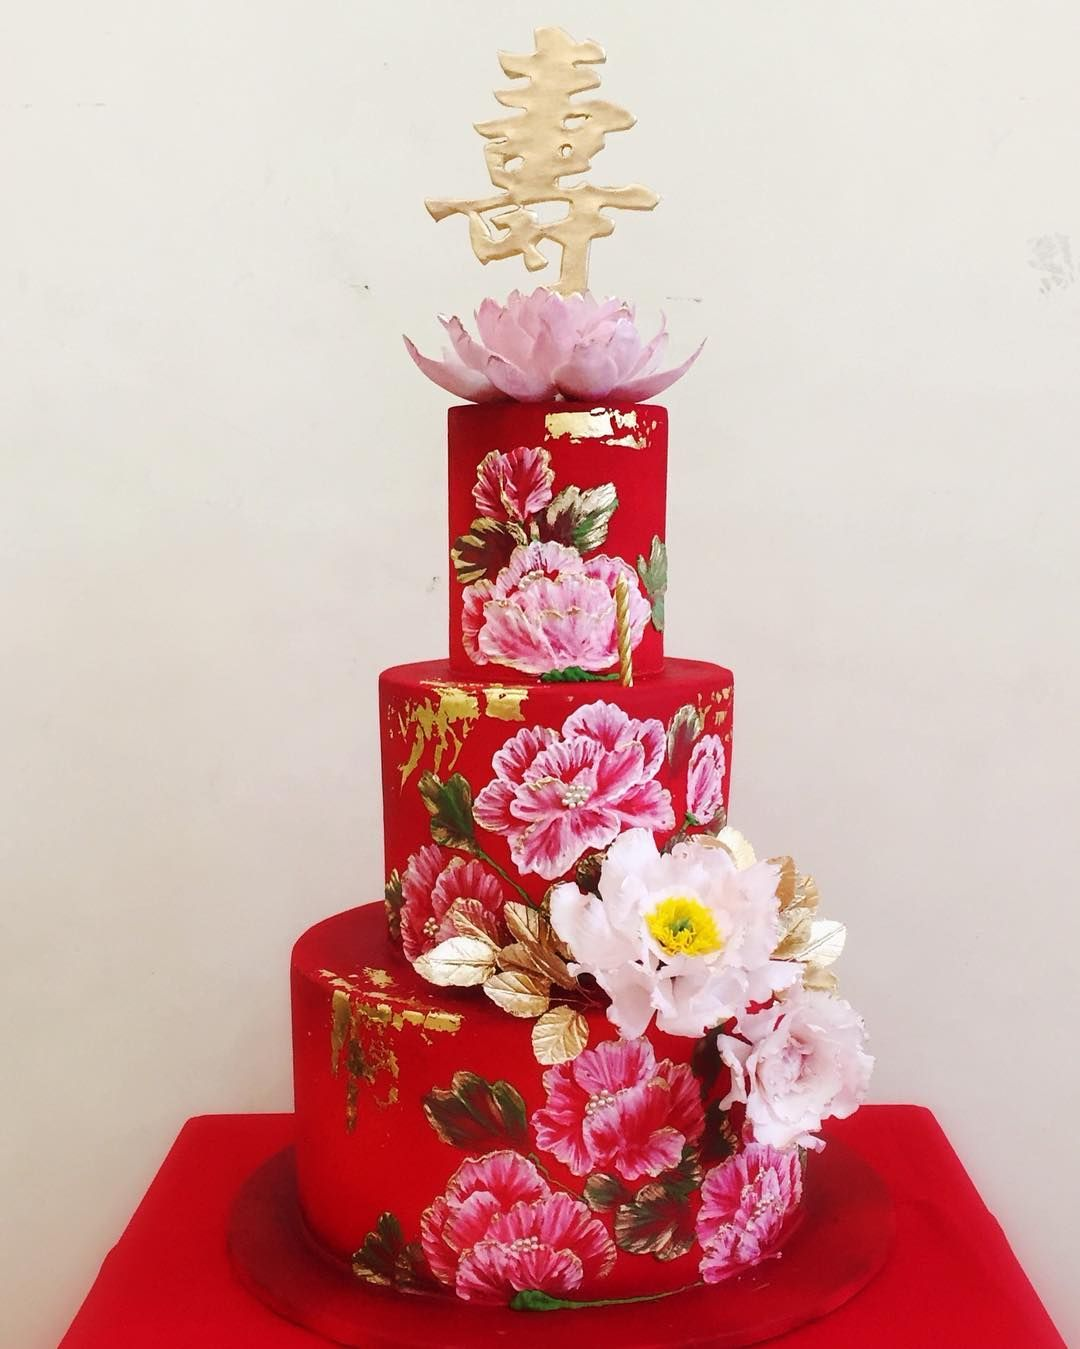 Happy 93rd Birthday Grandma Cakesbymannix Cakesforallocassions Customcakes Aintcakesgrand Cbmcak Red Birthday Cakes 70th Birthday Cake Dad Birthday Cakes